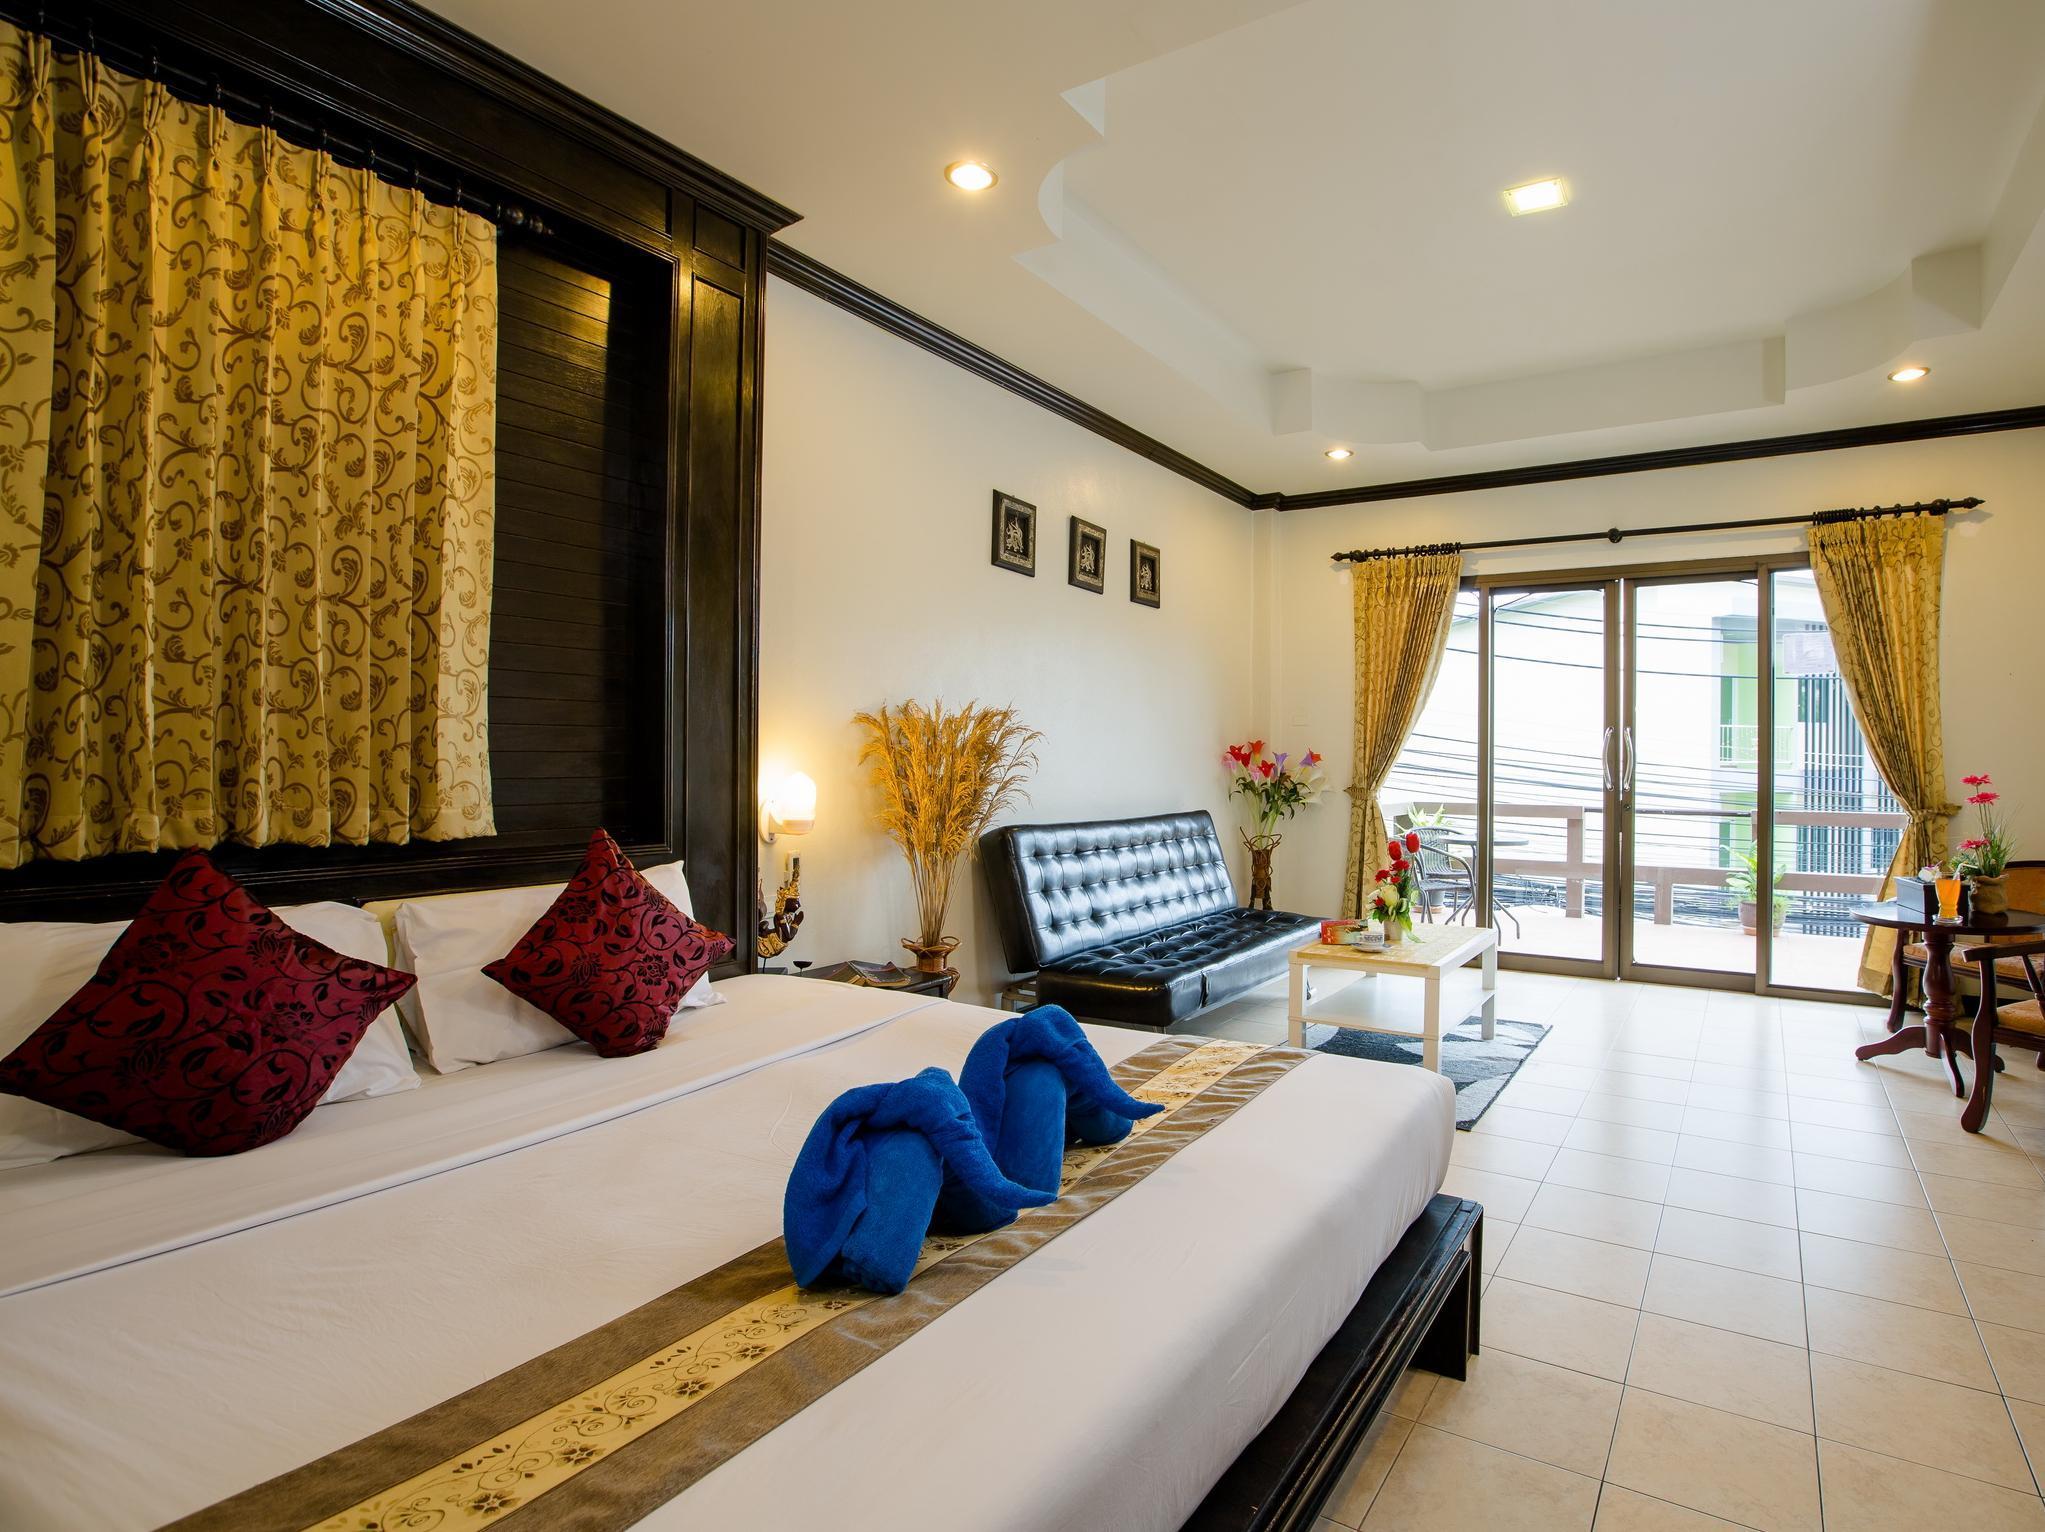 Baan Veerakit Guesthouse